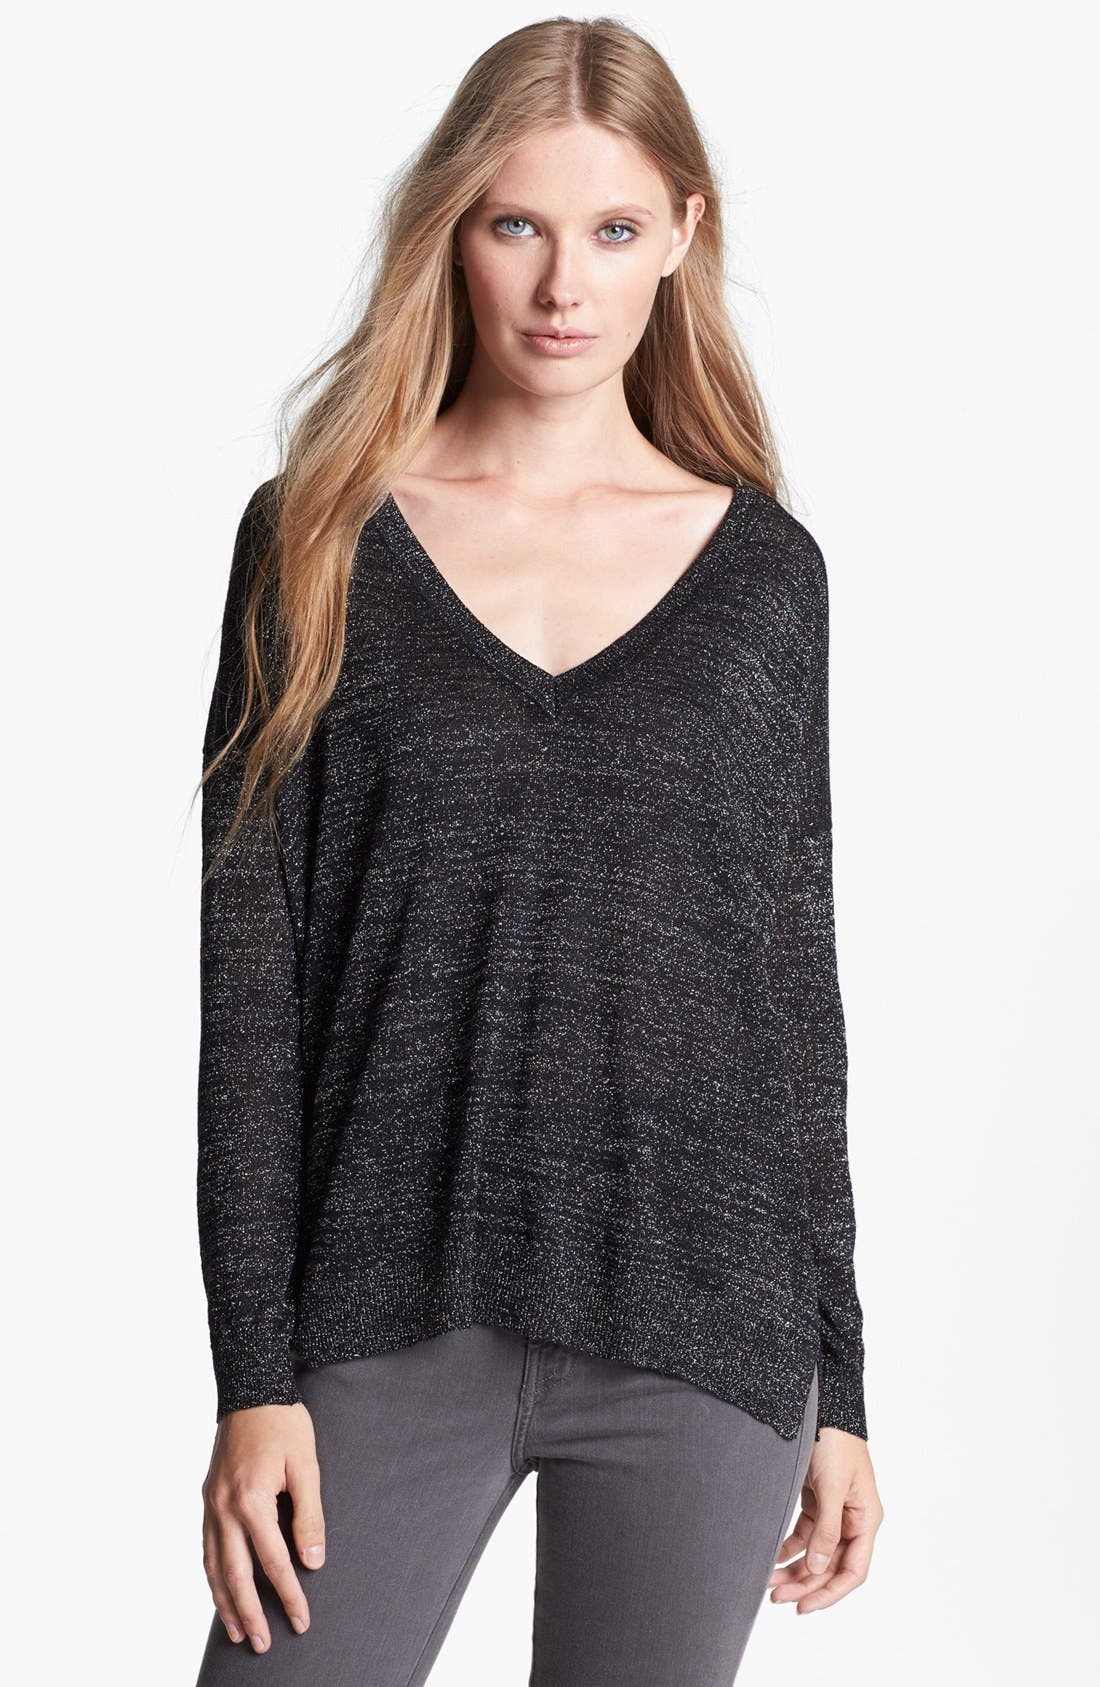 Main Image - Joie 'Calee' Metallic Sweater